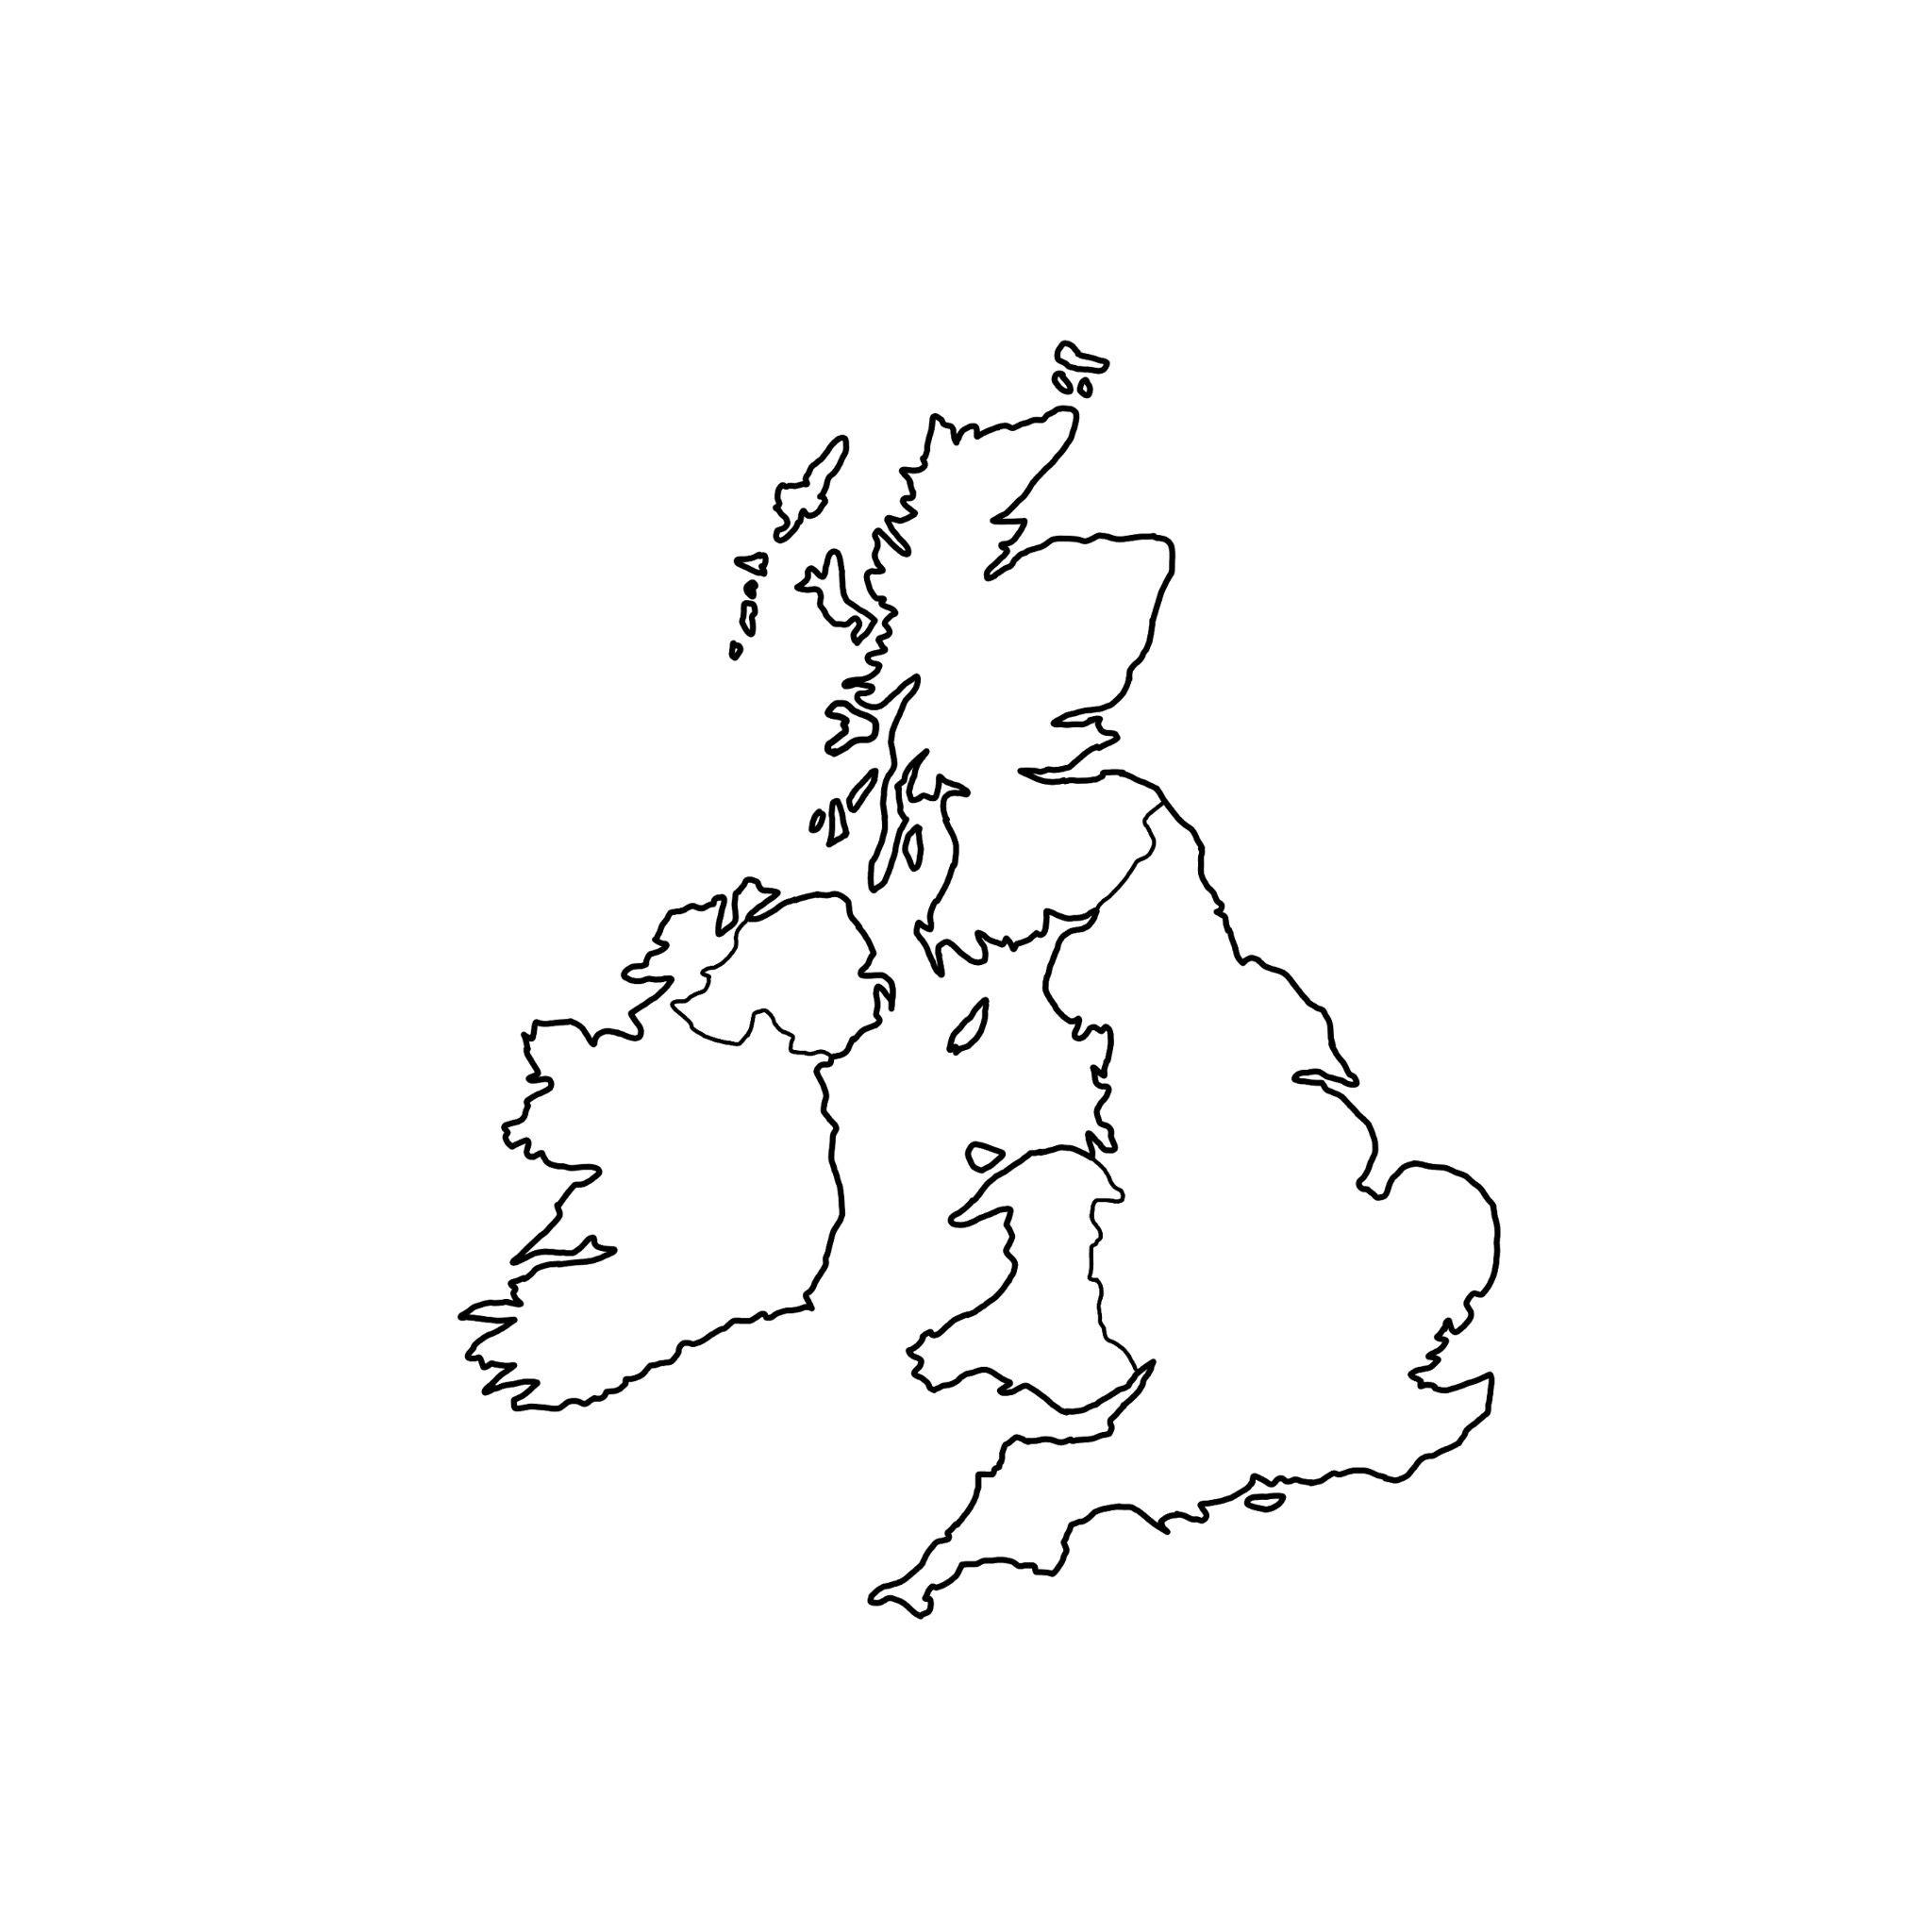 Map Of British Isles